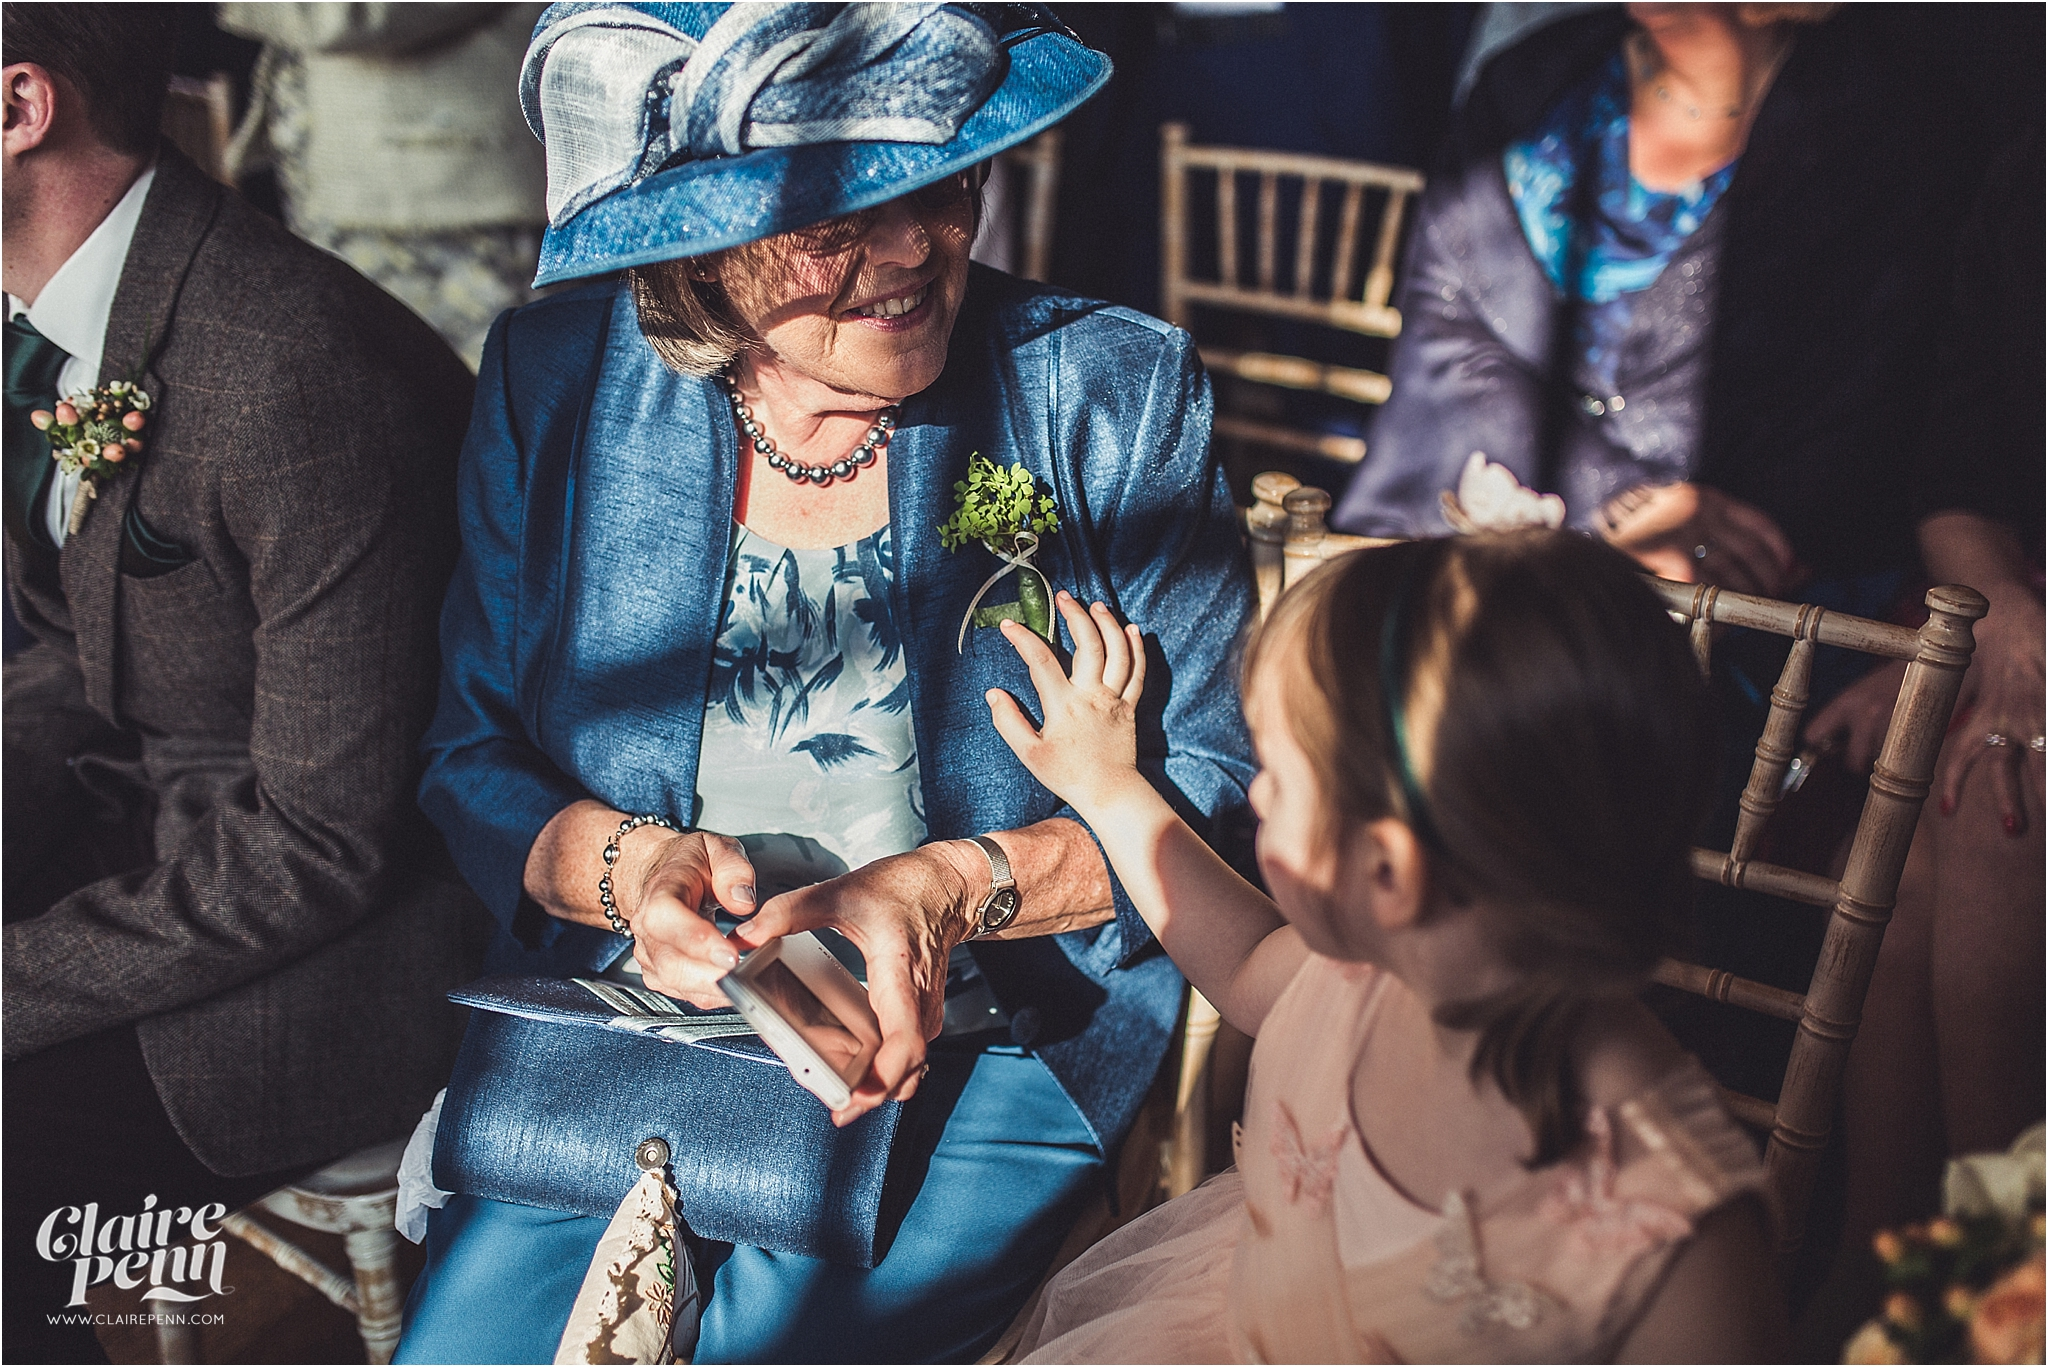 Iscoyd Park wedding, Whitchurch, Cheshire wedding photographer_0024.jpg